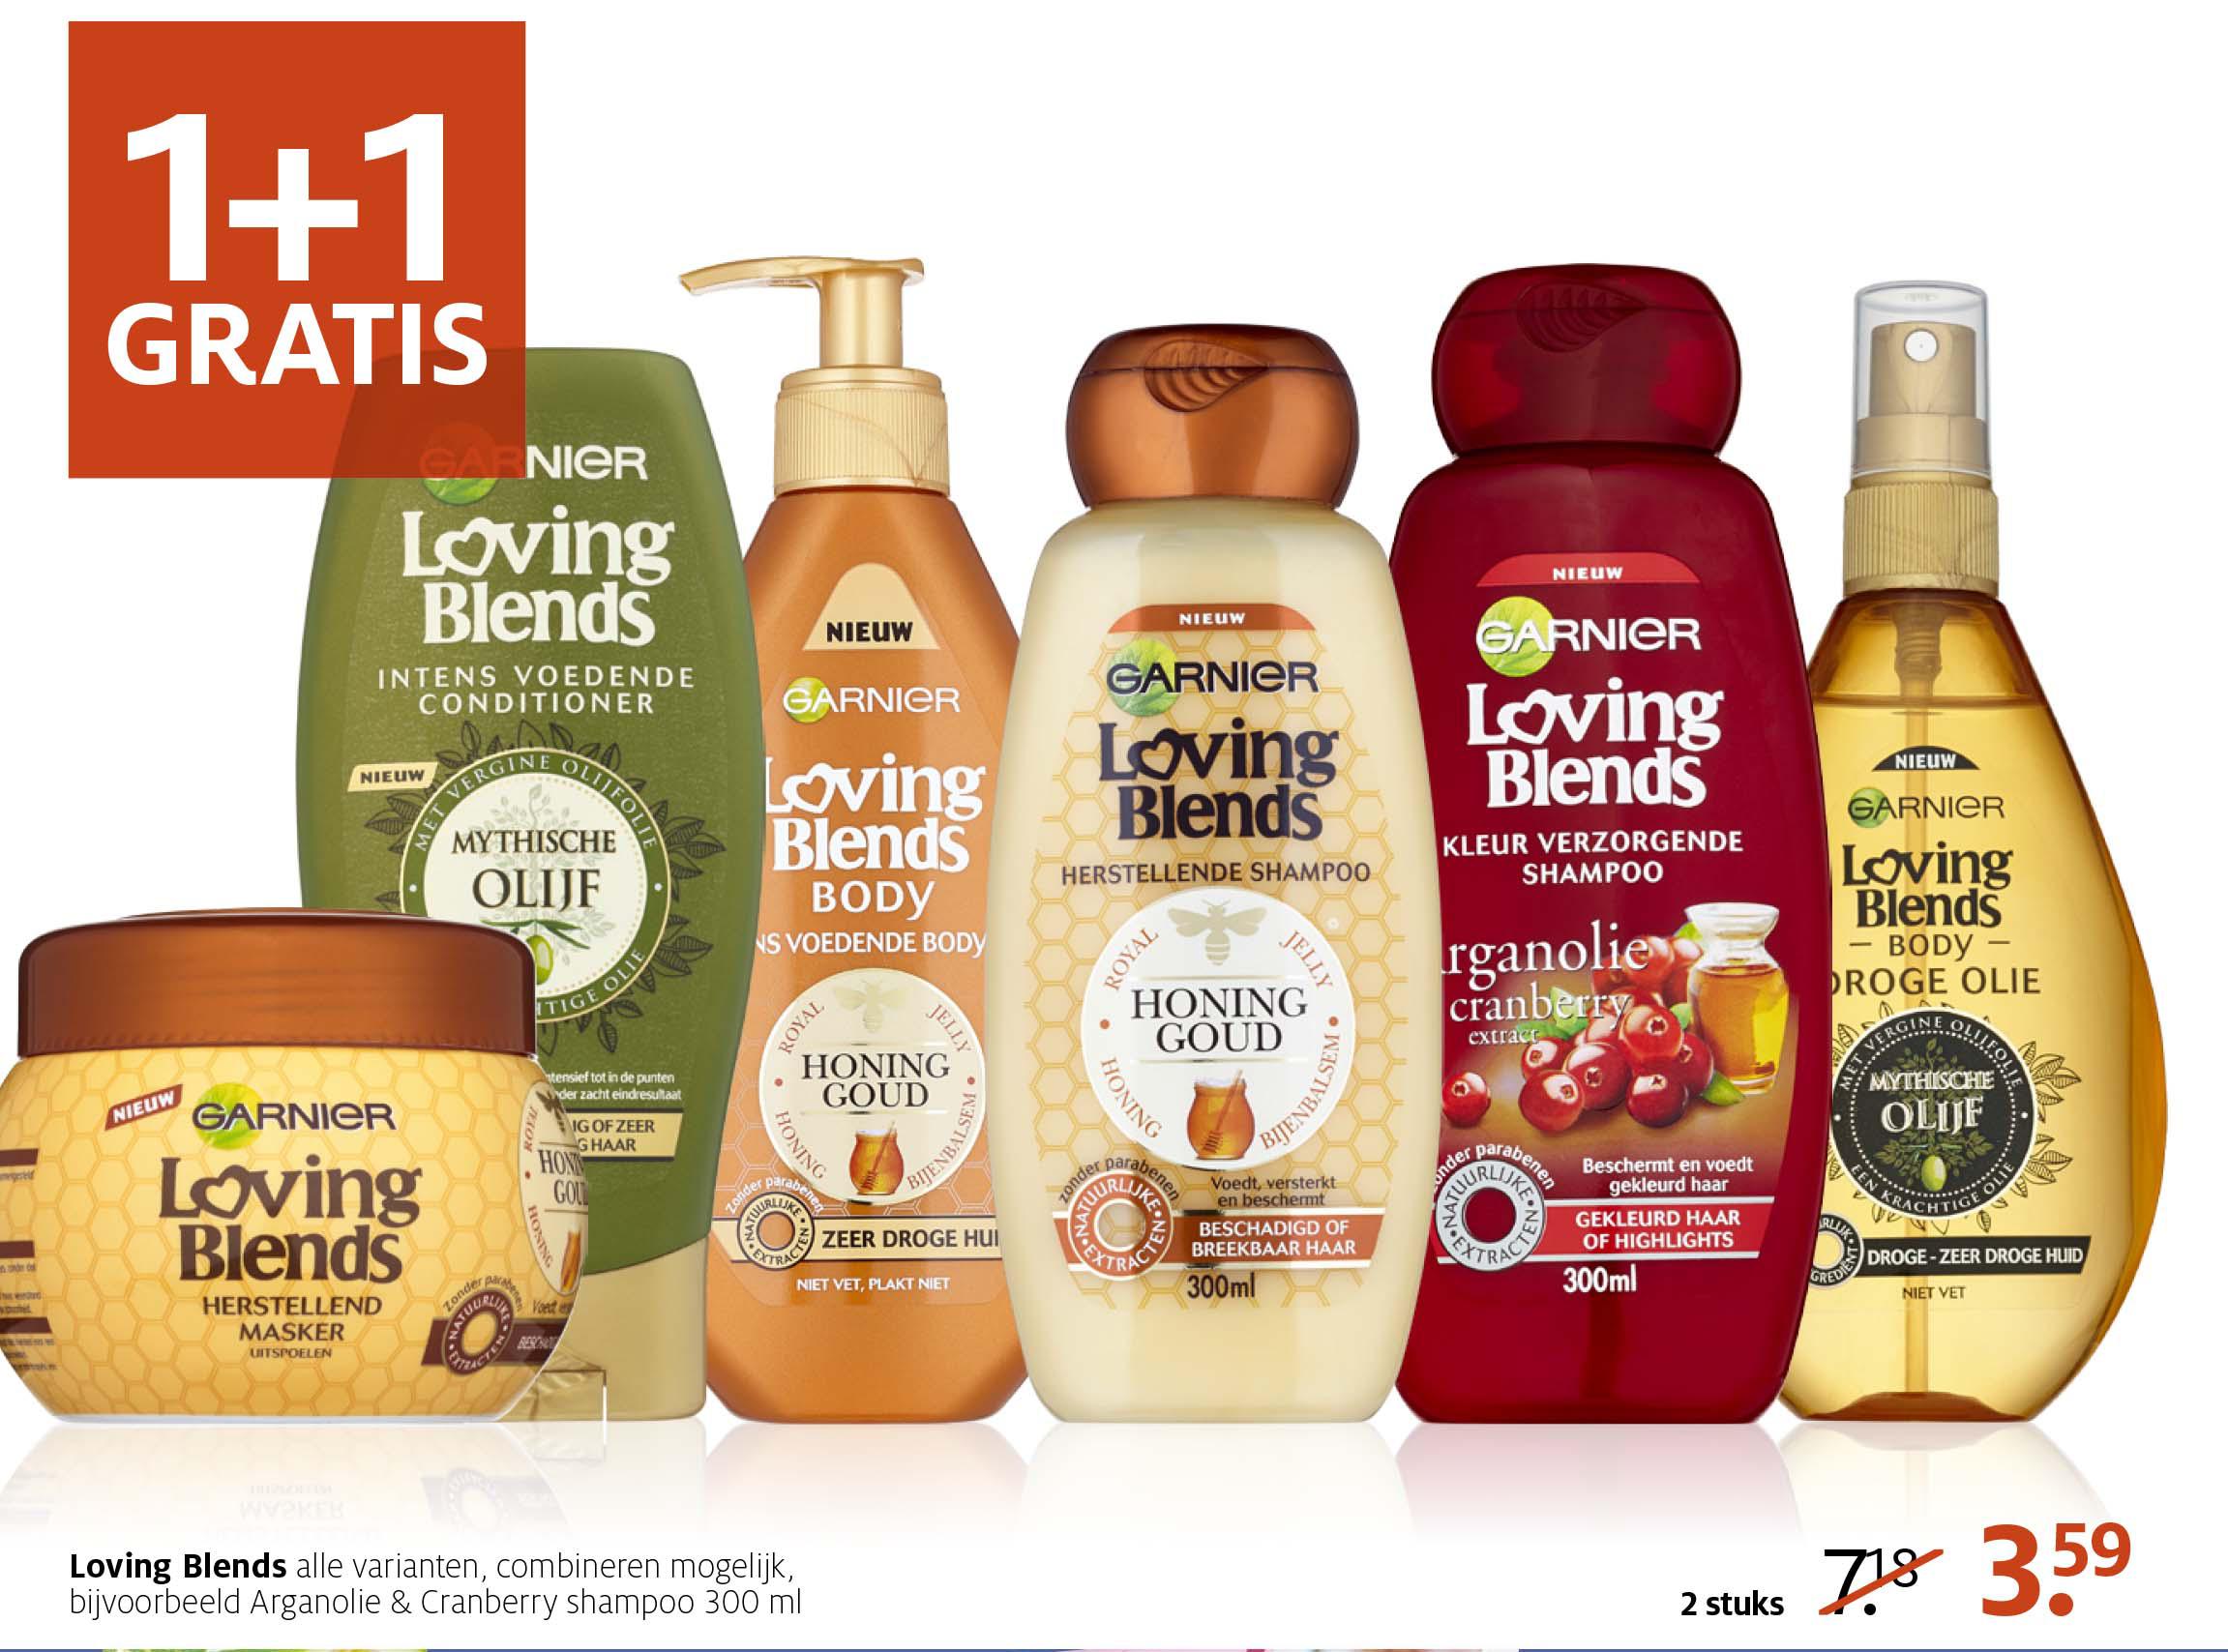 Etos Garnier Loving Blends: 1+1 Gratis